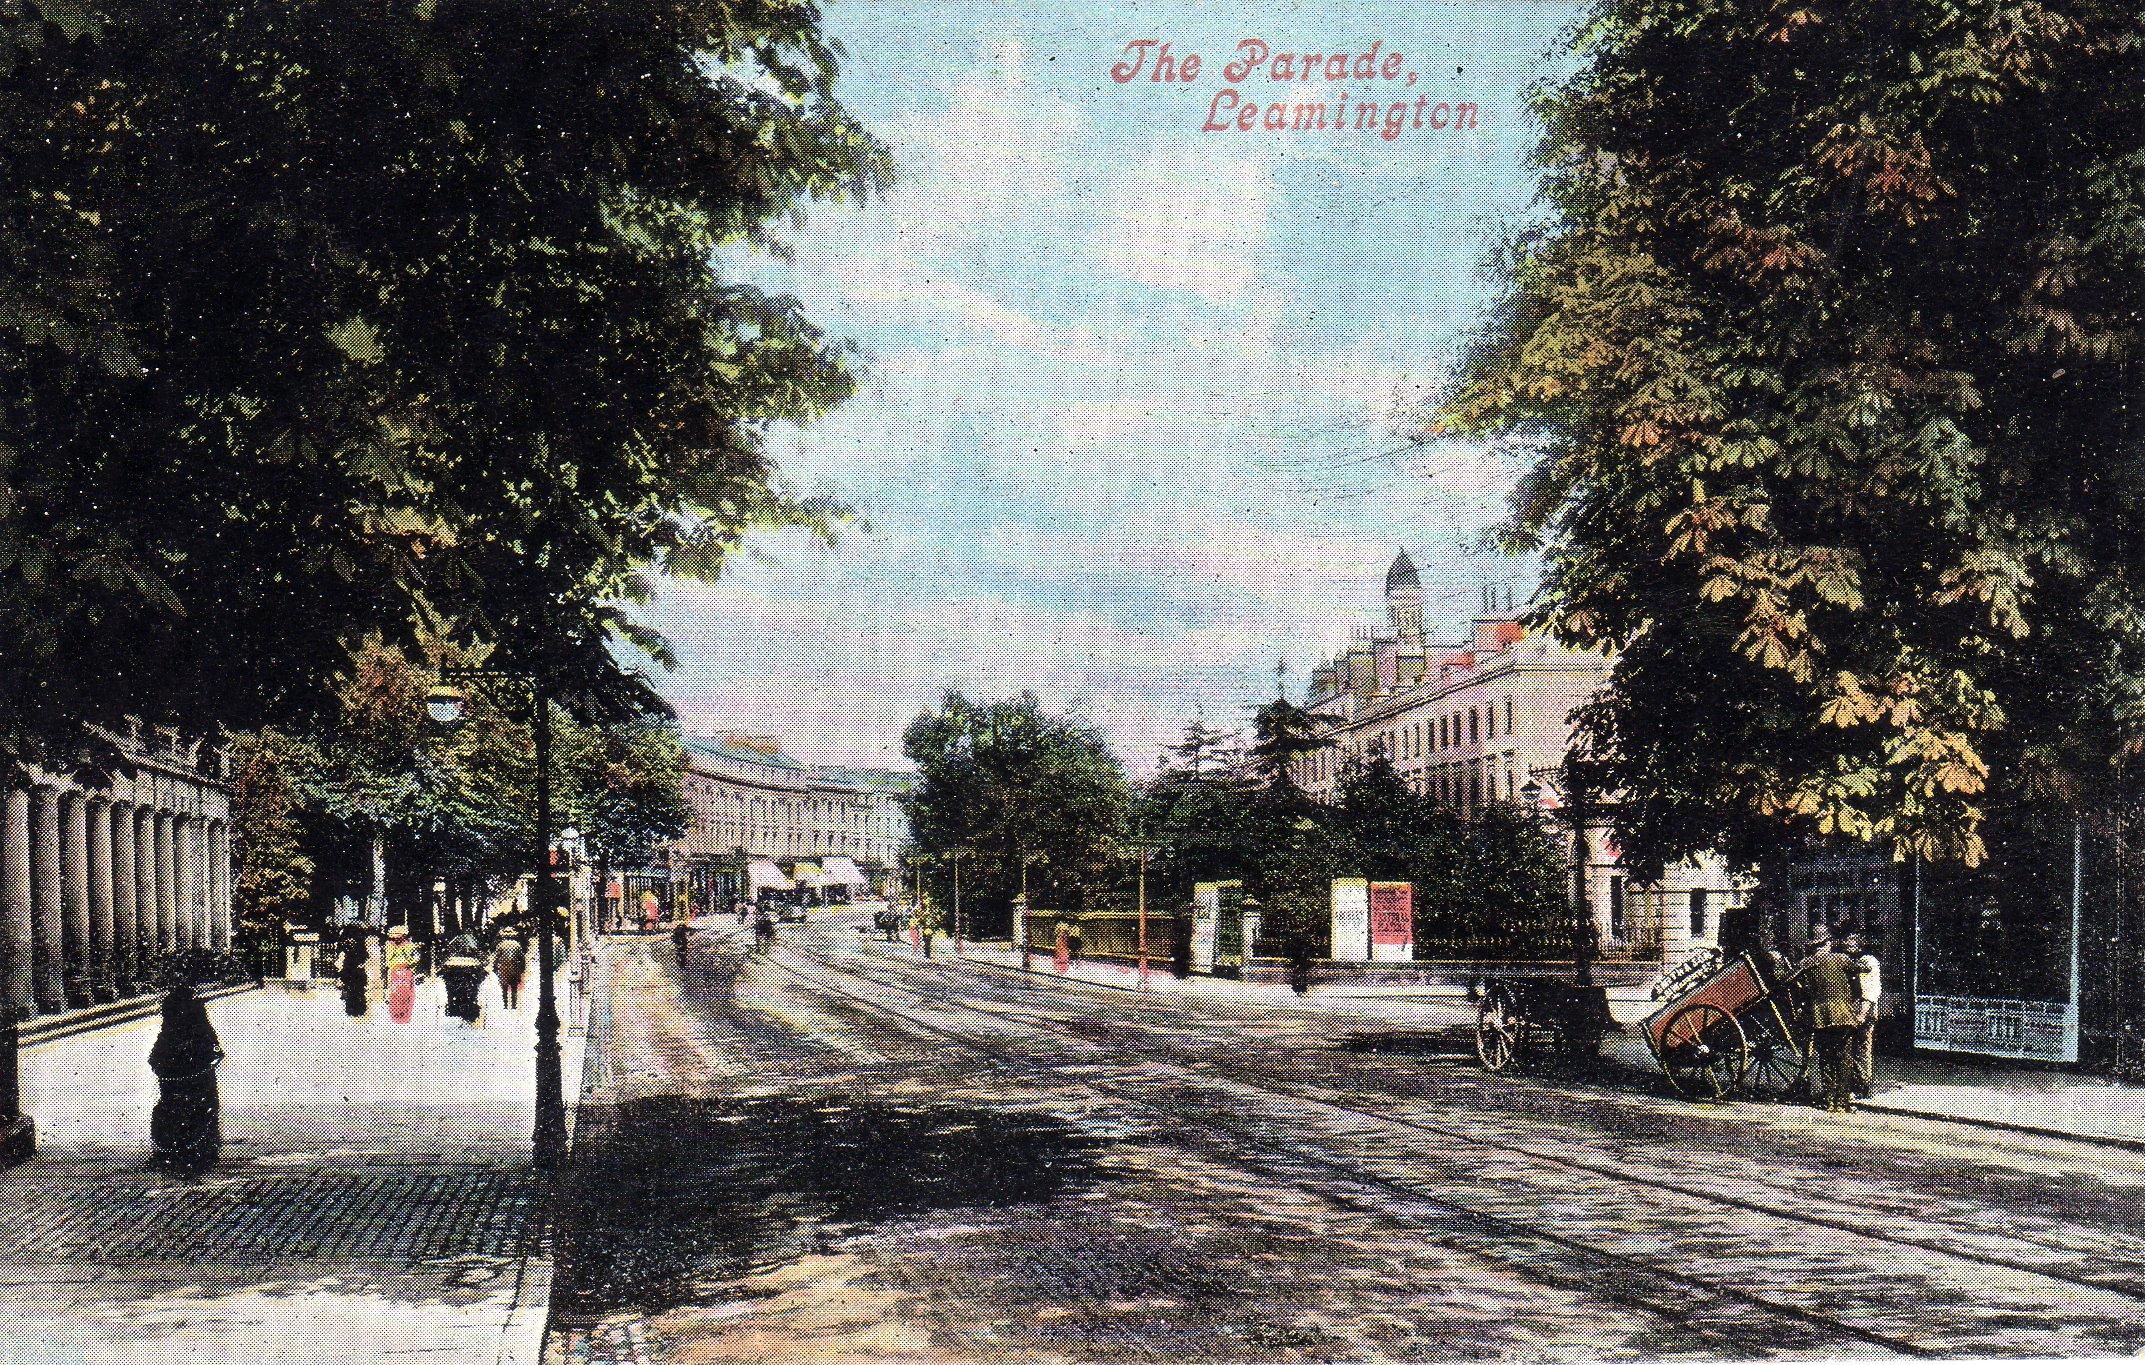 Lower Parade